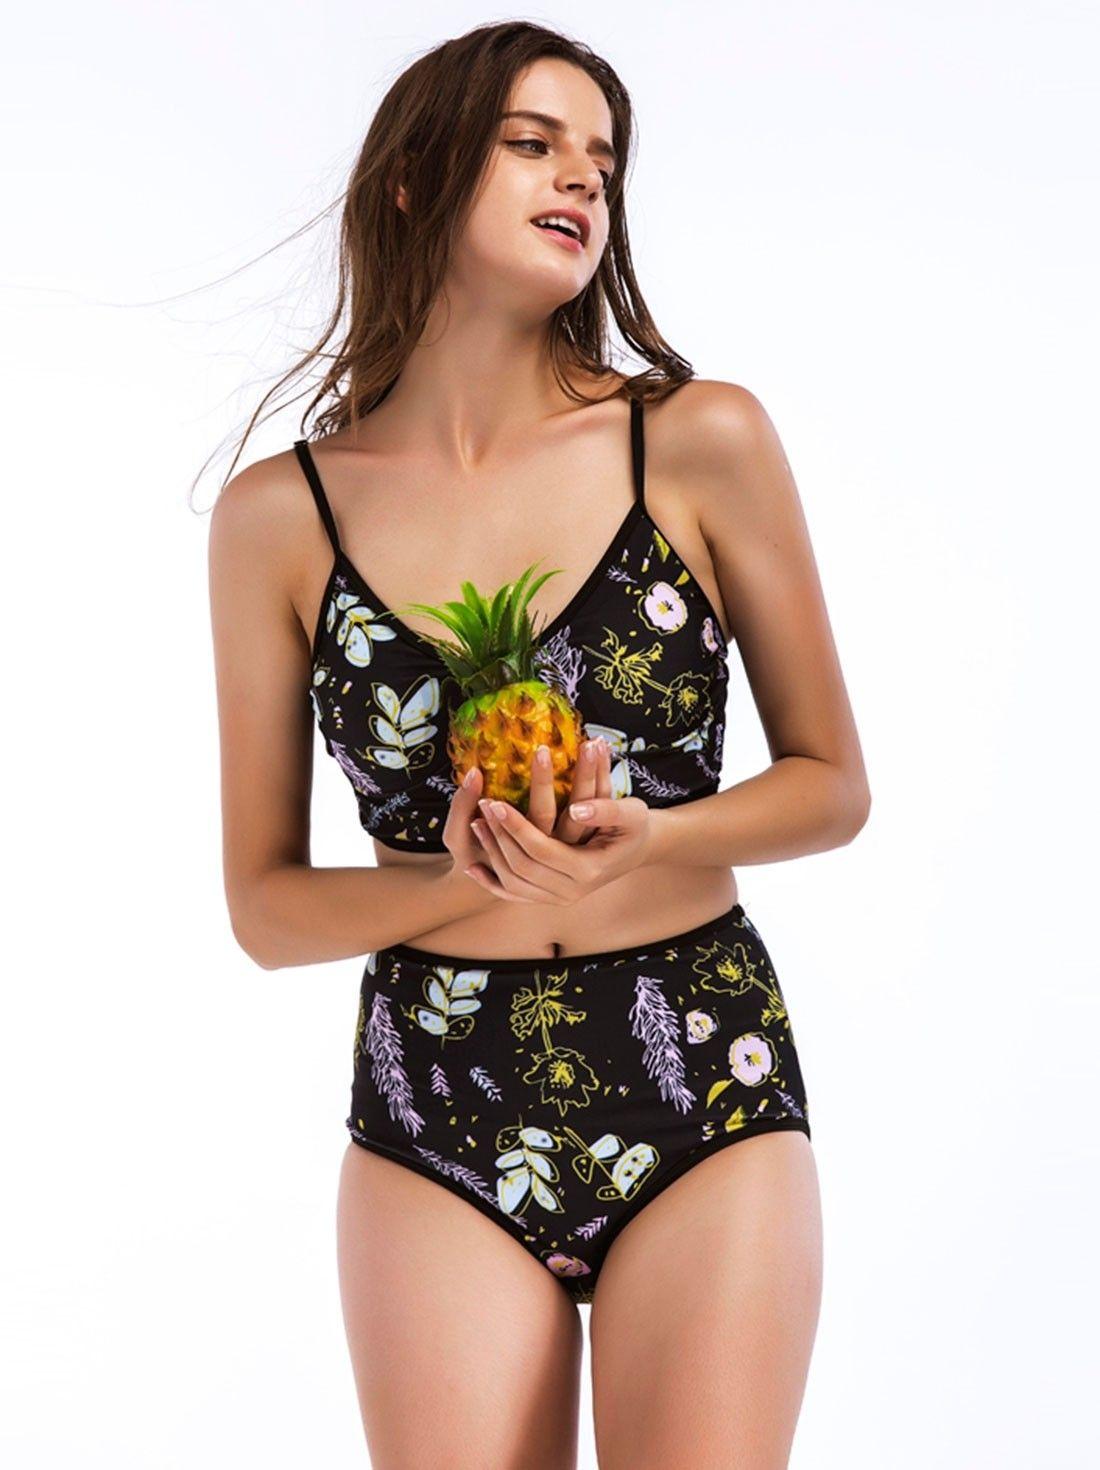 0115078dd7c75 Dresswel Women Sexy Floral Print Adjustable Spaghetti Straps Cold Shoulder  High Waist Two Piece Bikini Set Swimsuit $12.99 #dresswel #women #fashion  ...